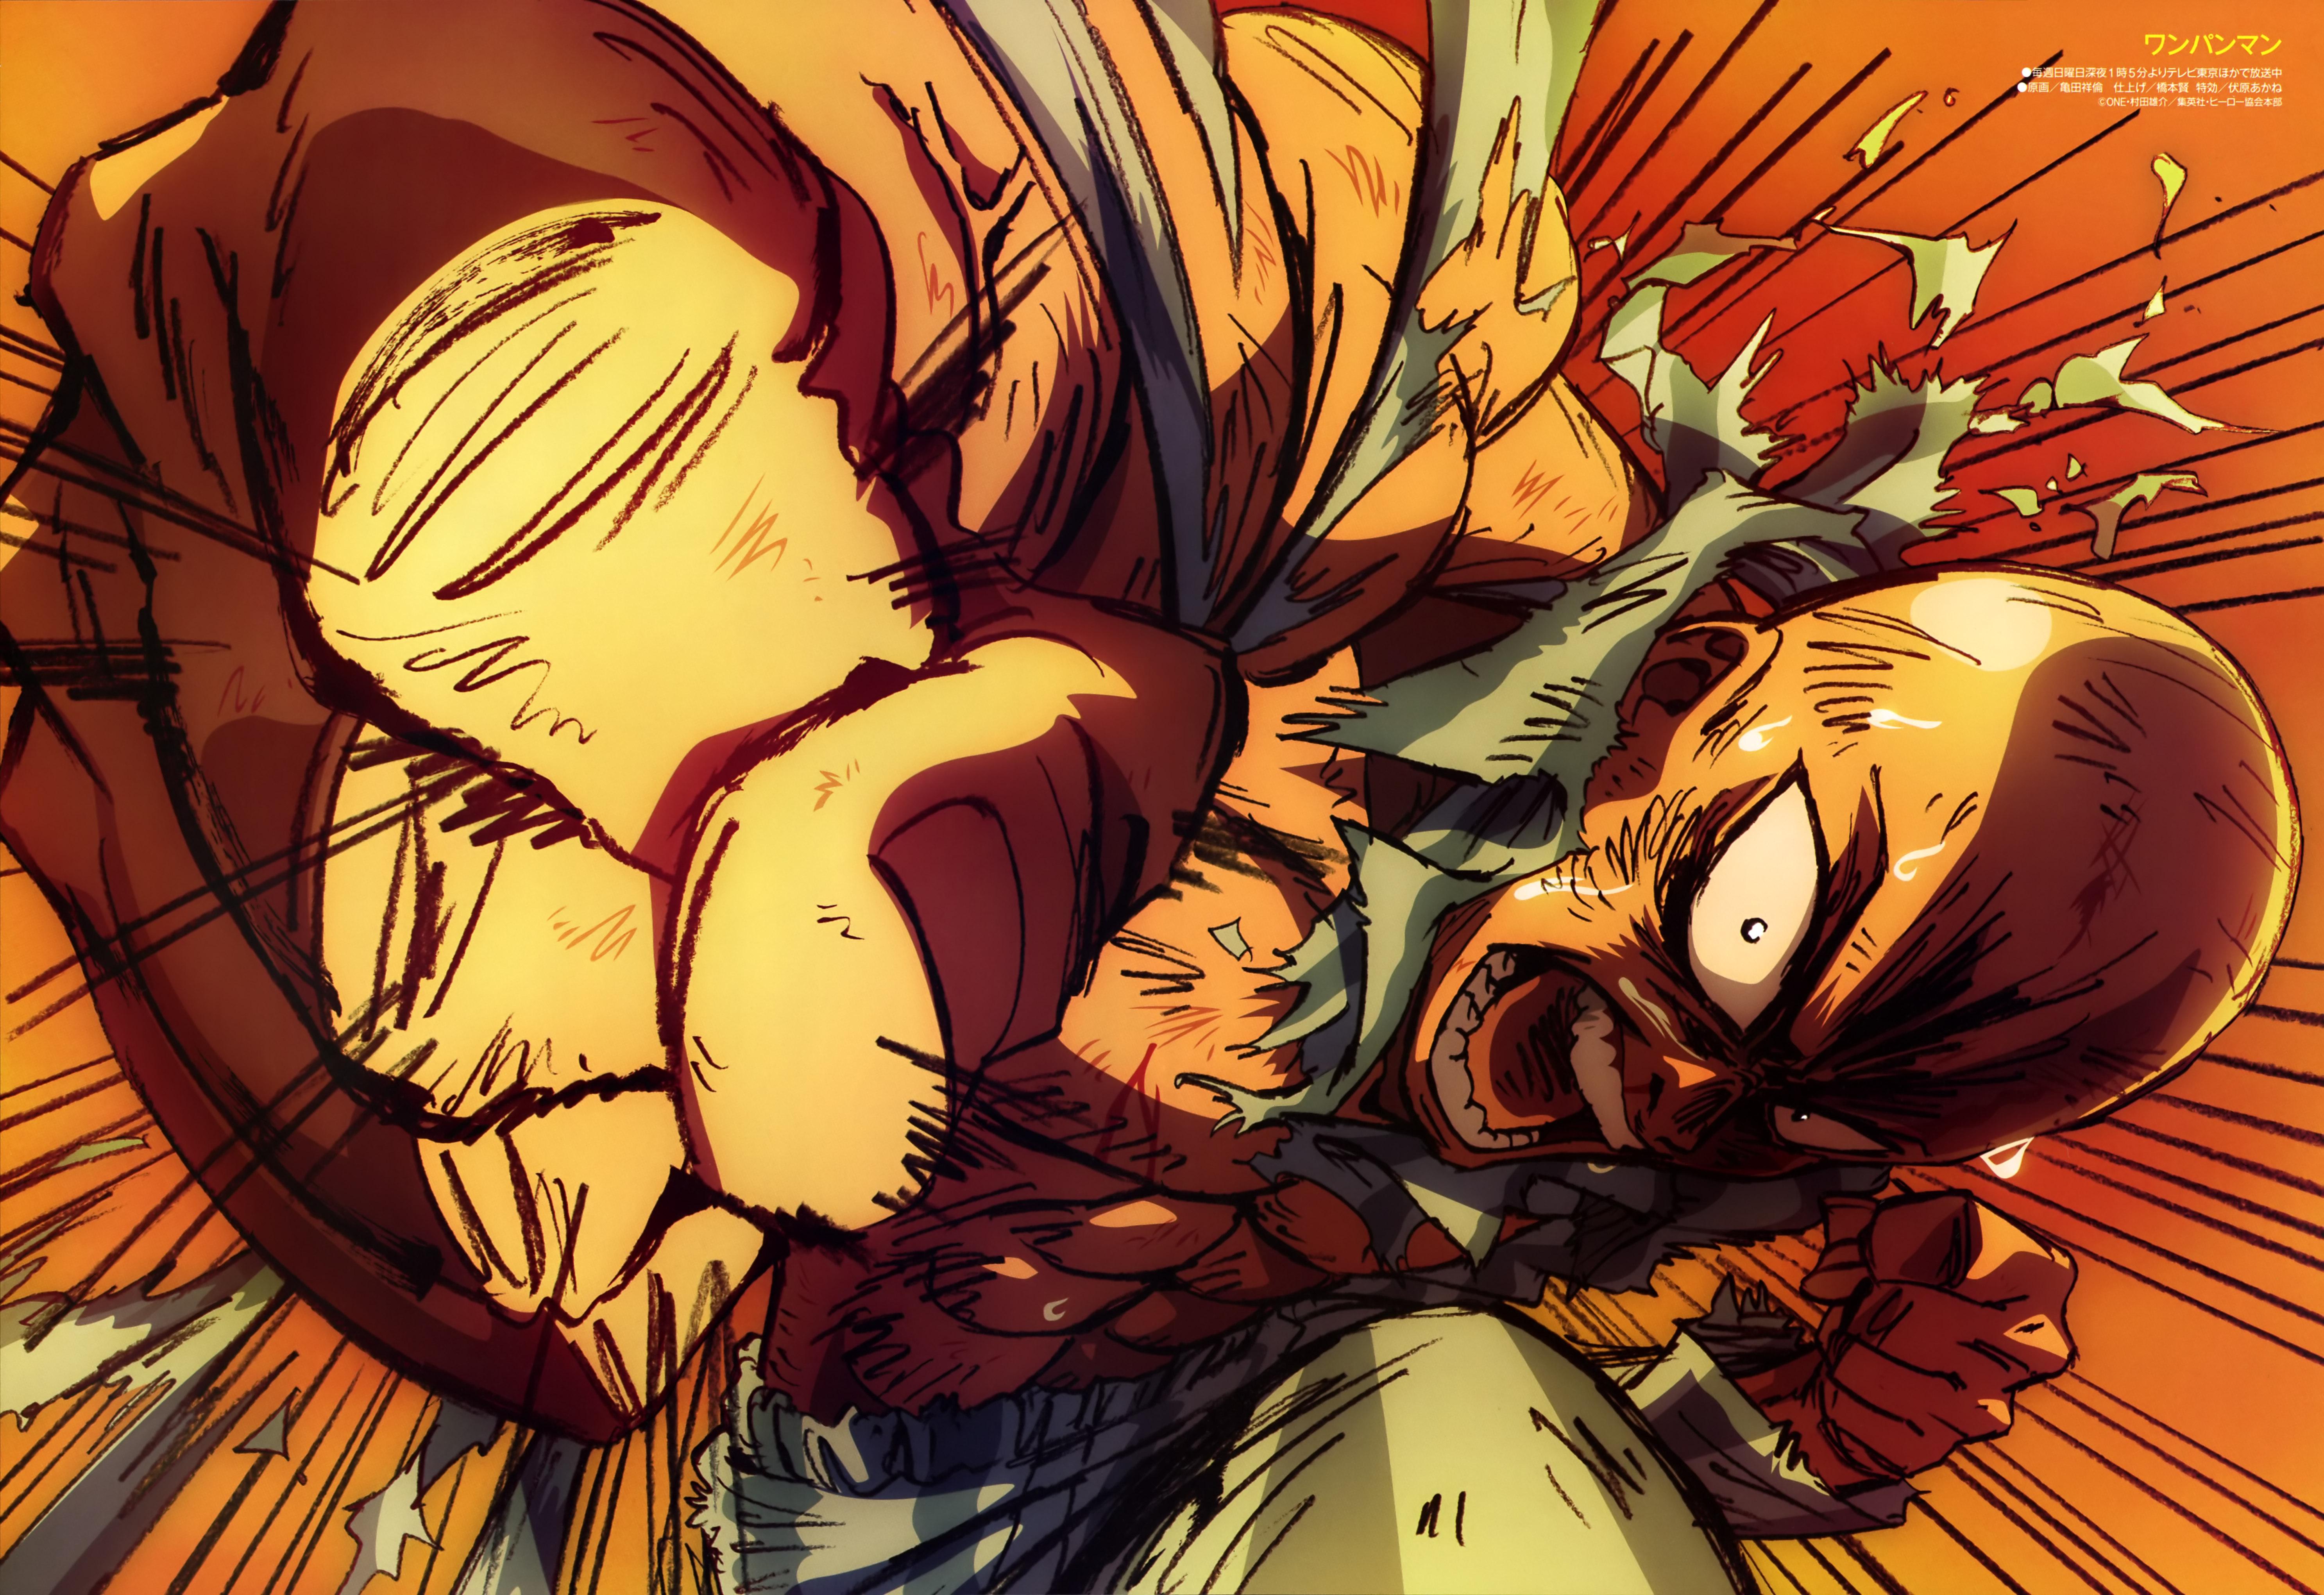 Saitama Images Hd - One Punch Man Wallpaper HD Saitama Anime by corphish2 on ...